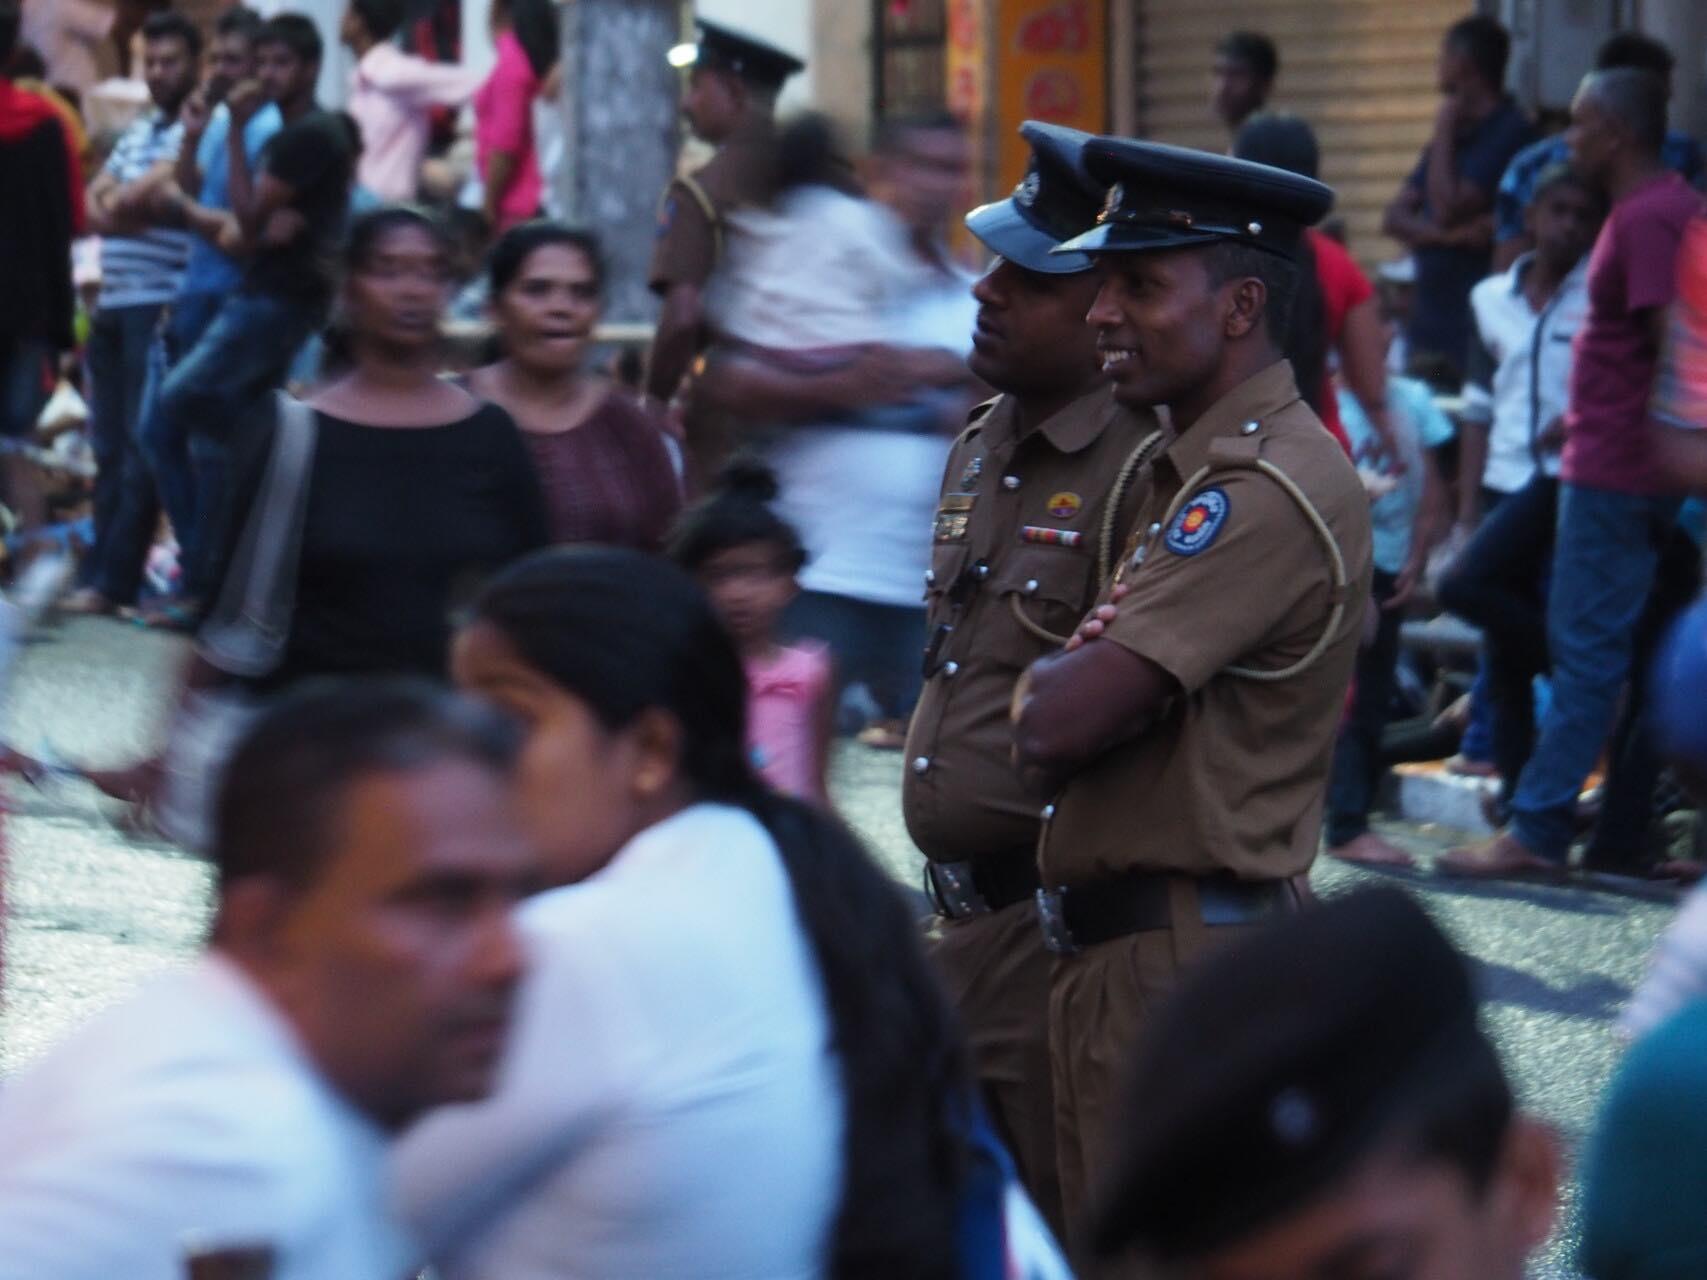 sri-lanka-kandy-perahera-people-holiday-review-feedback-invite-to-paradise-quentin-kate-hulm.jpg